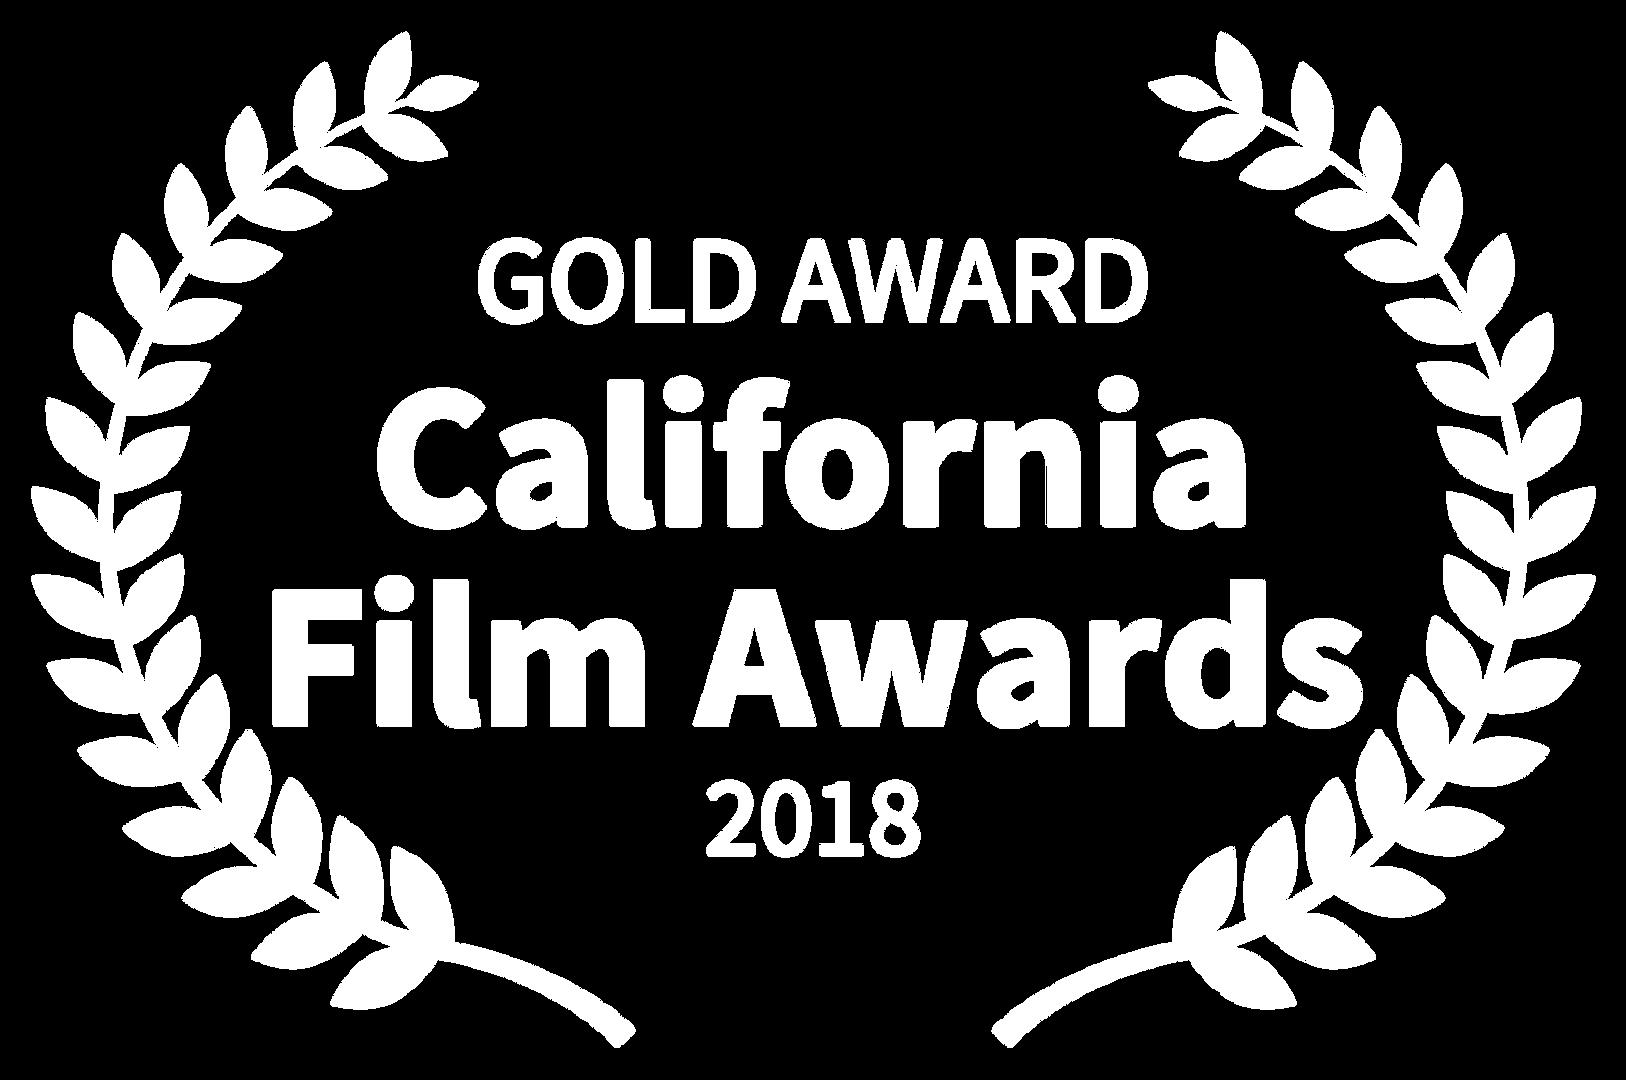 GOLD AWARD - California Film Awards - 20